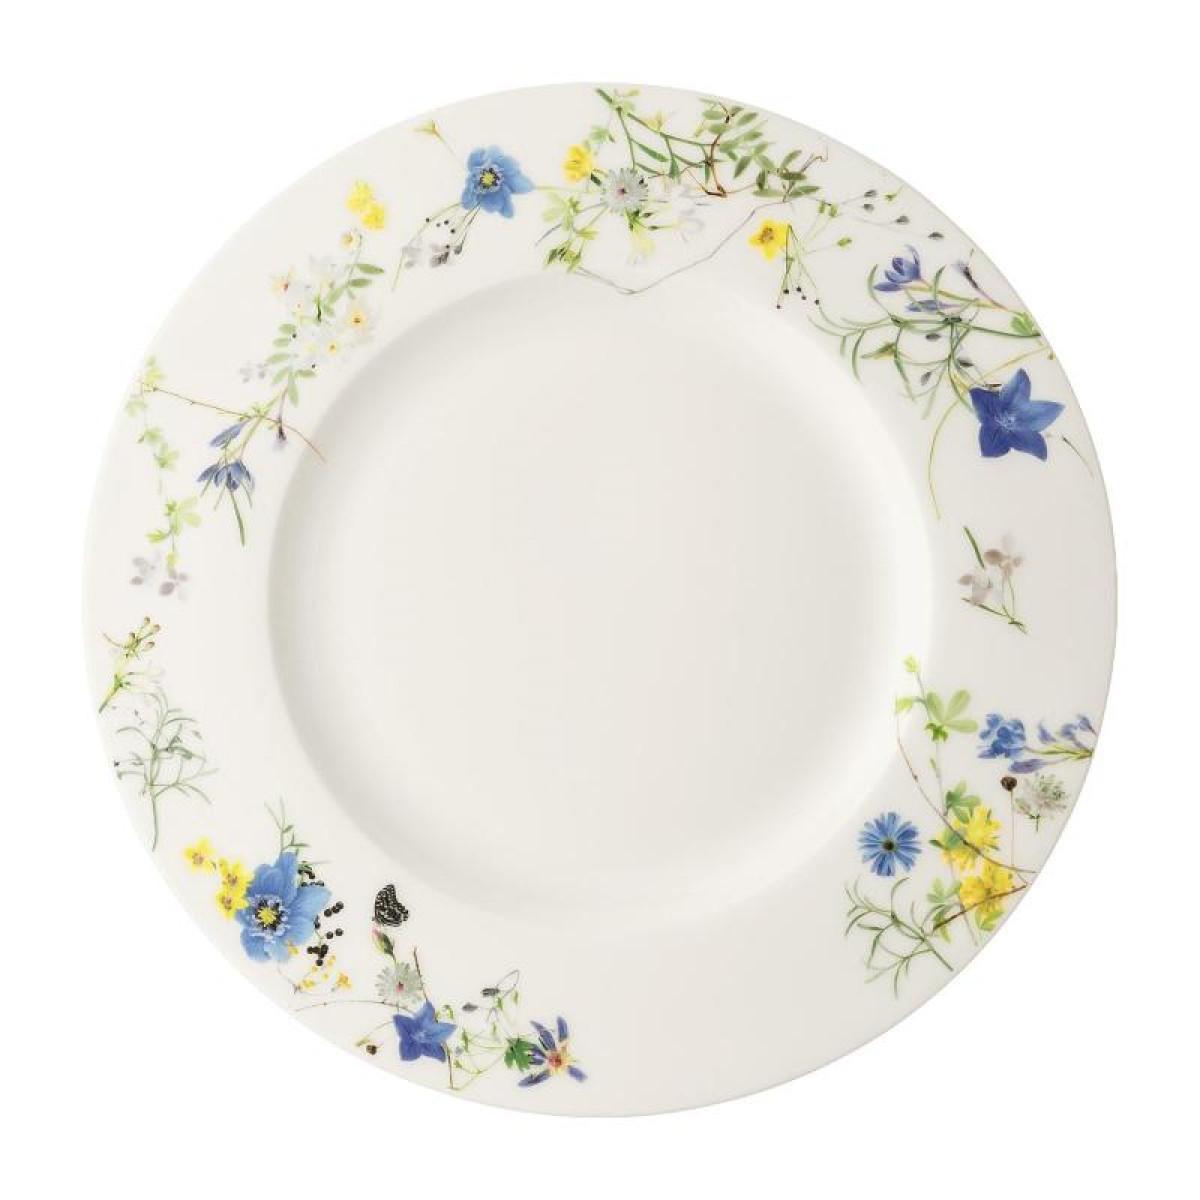 rosenthal selection brillance fleurs sauvages тарелка coup 27 см Тарелка закусочная с бортом Rosenthal Альпийские цветы 23 см